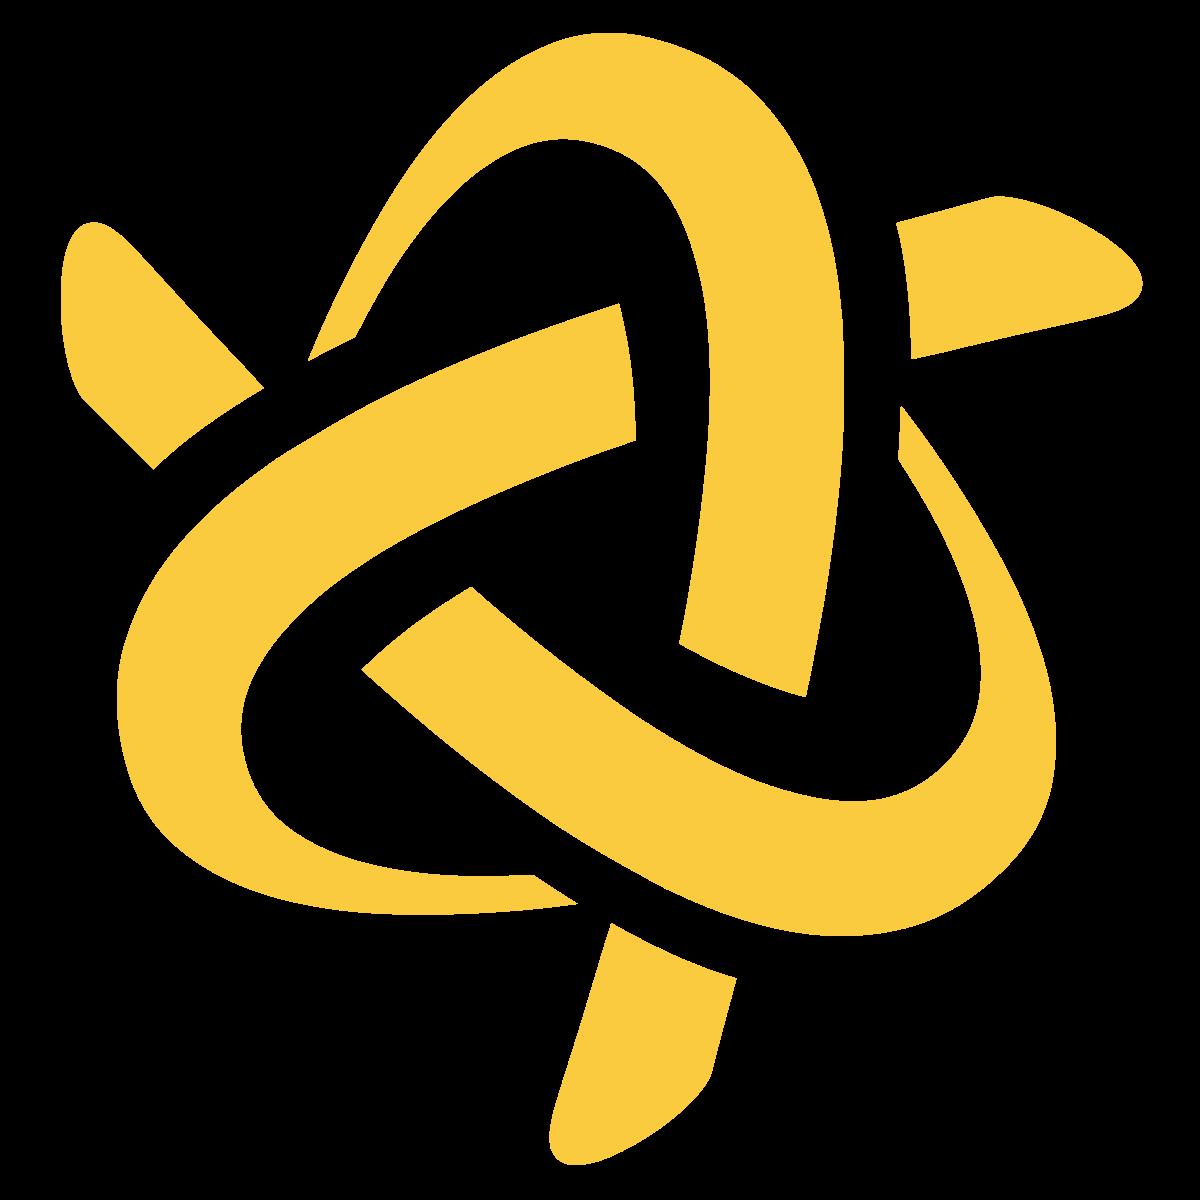 Go to Unity Digital Agency's profile